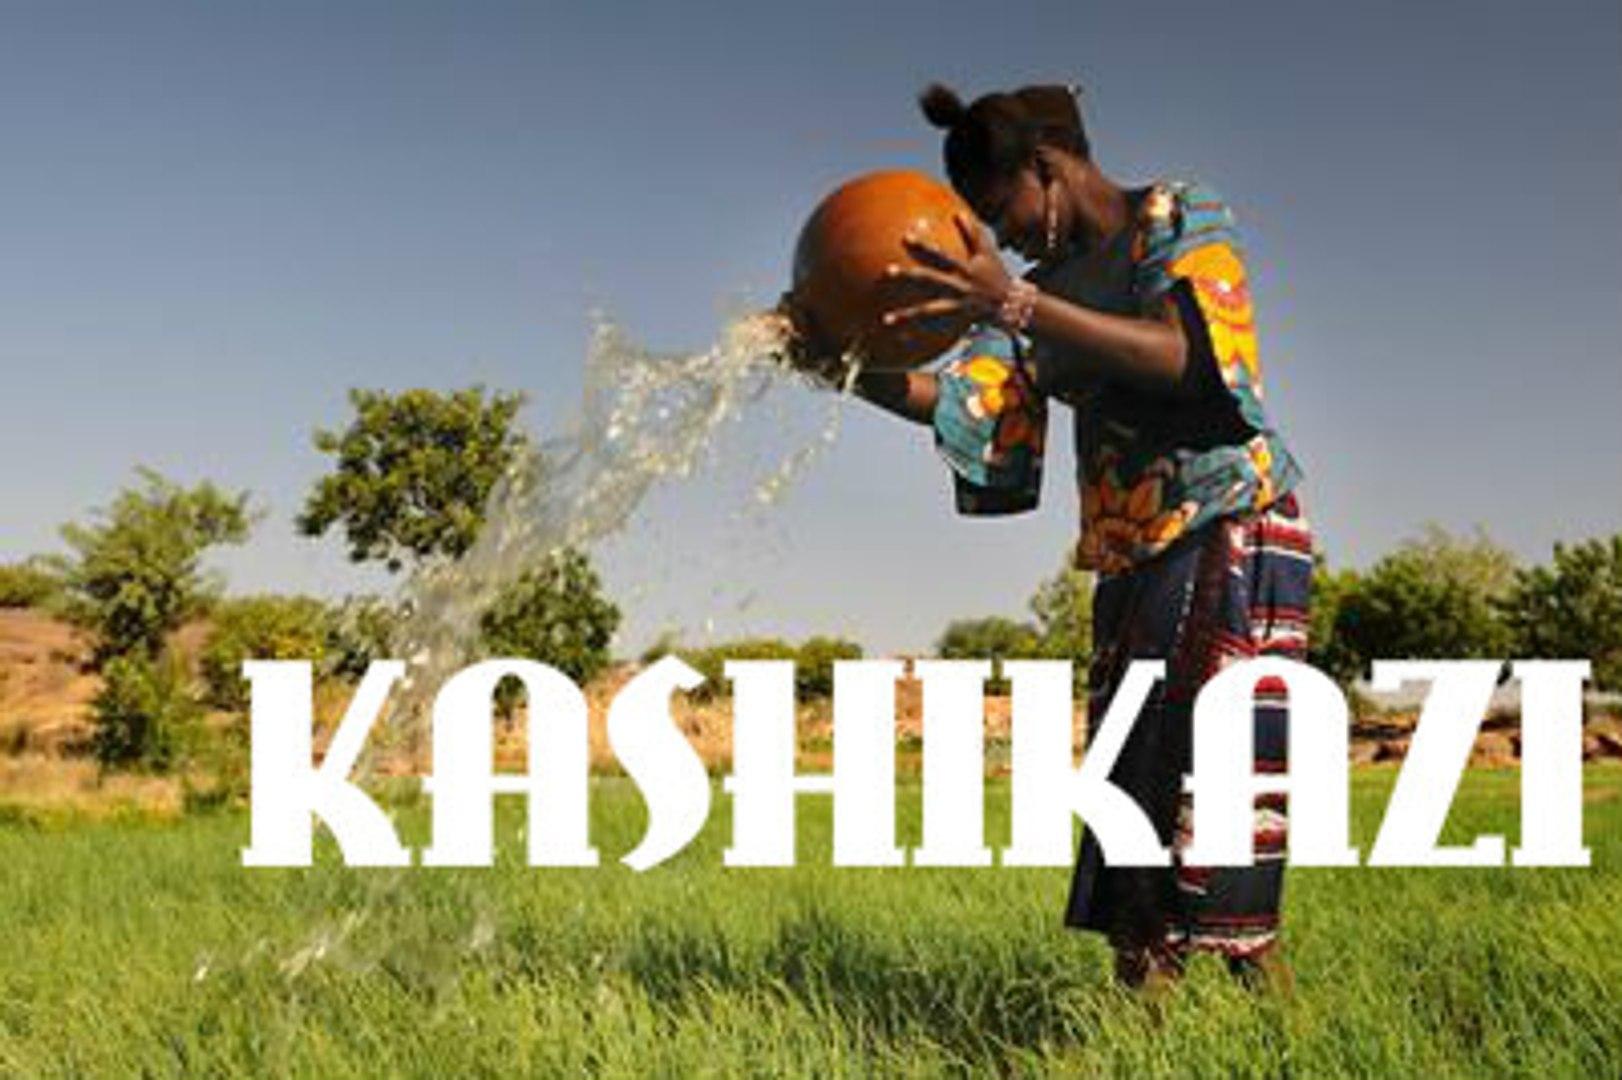 Mawana Afrobeat - KASHIKAZI - Yoruba-groove (Voodoo-mix)